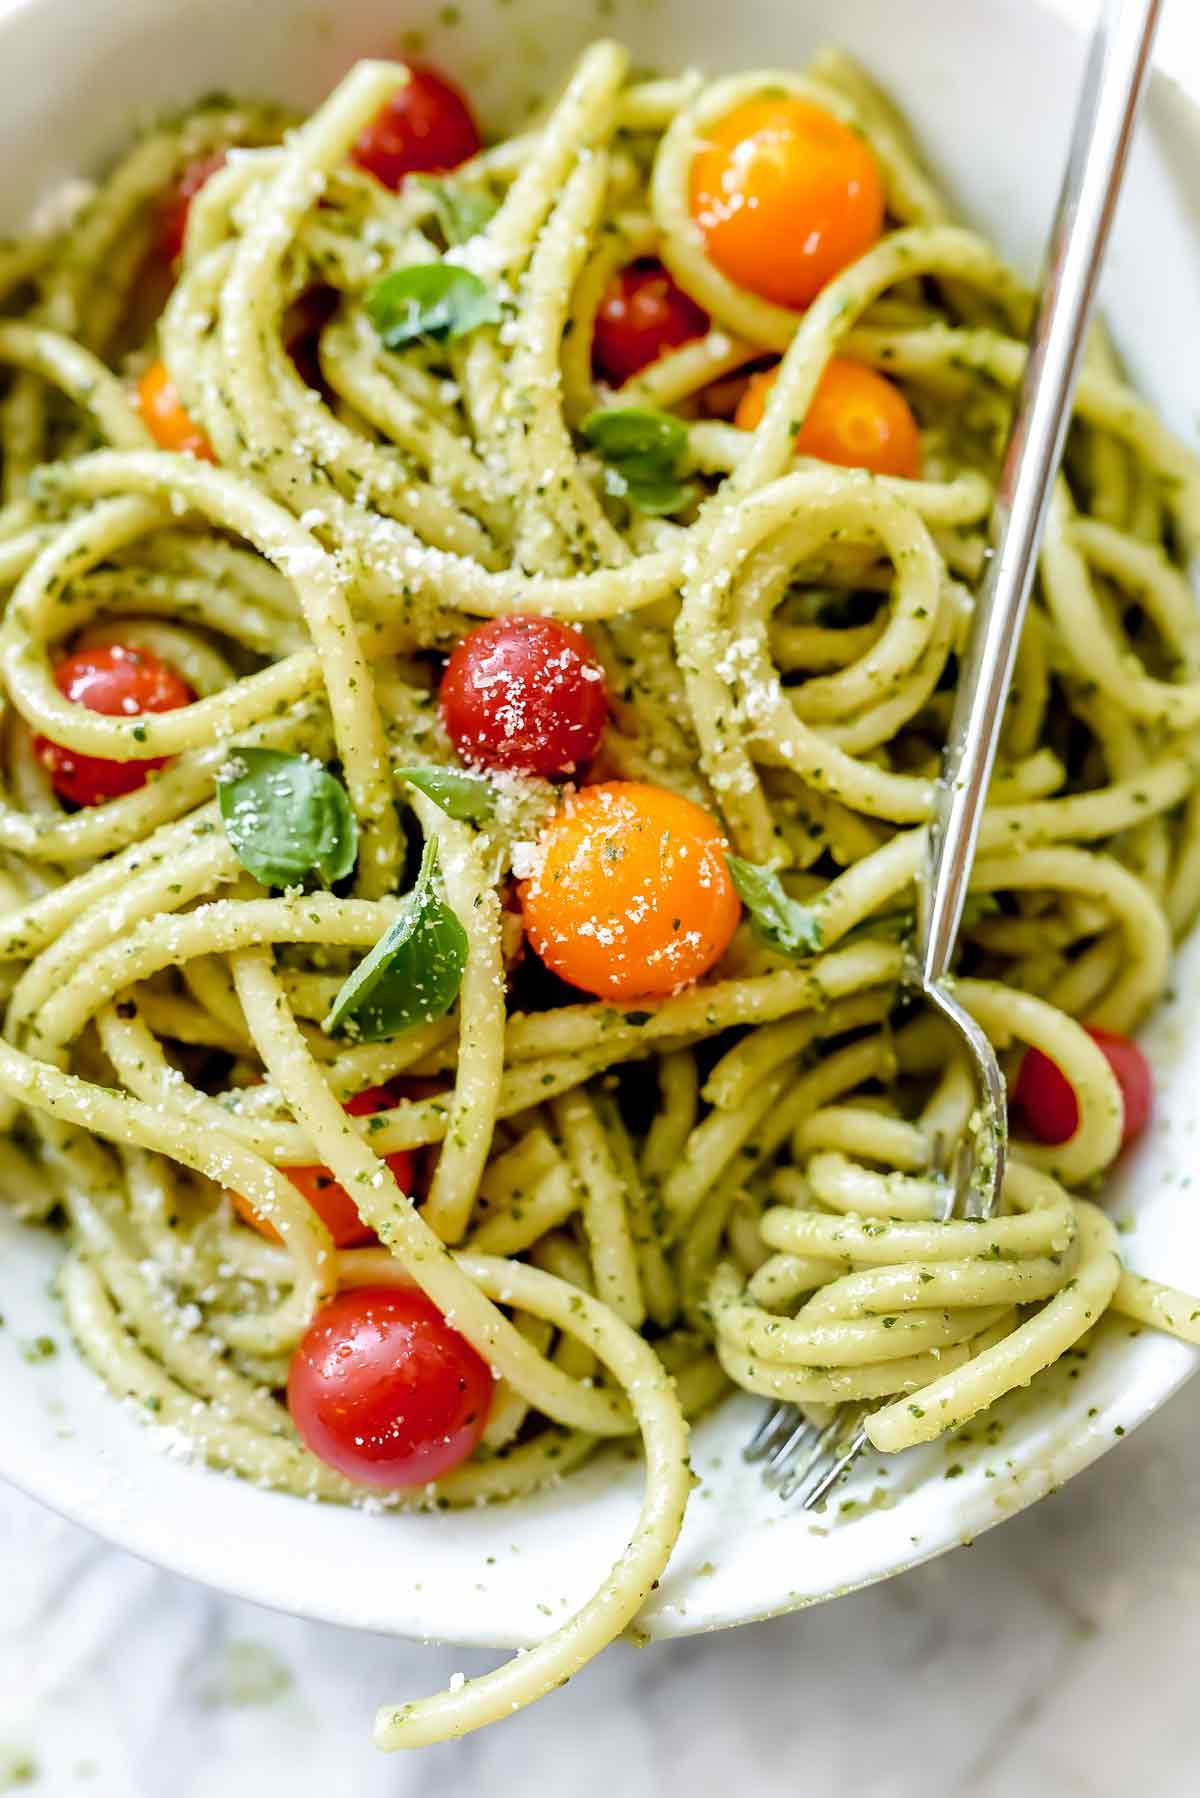 Pasta Recipes Auto Electrical Wiring Diagram Bmw Spaghetti Easy Homemade Pesto Recipe